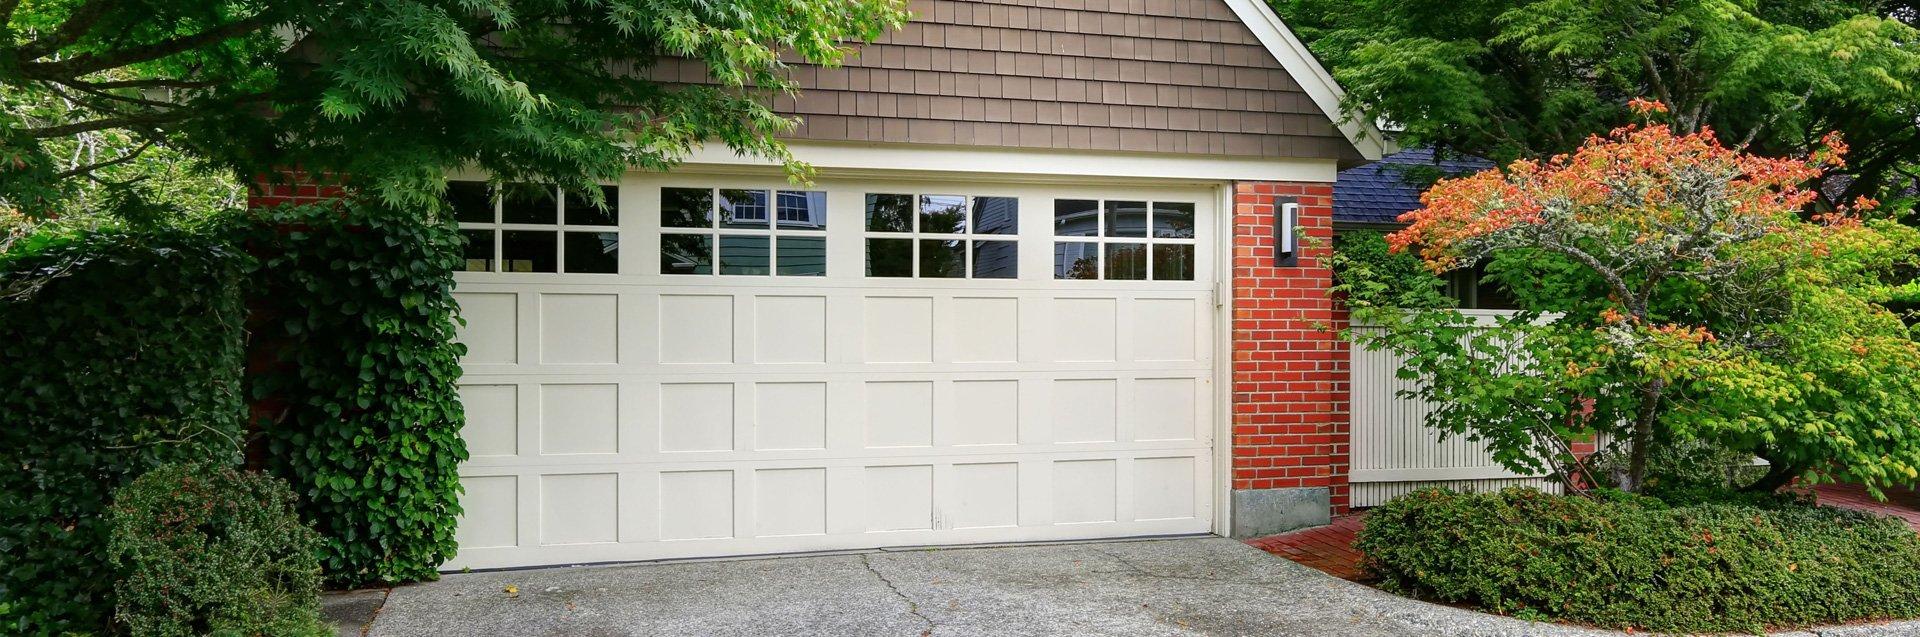 Garage Door Installation And Repair Services